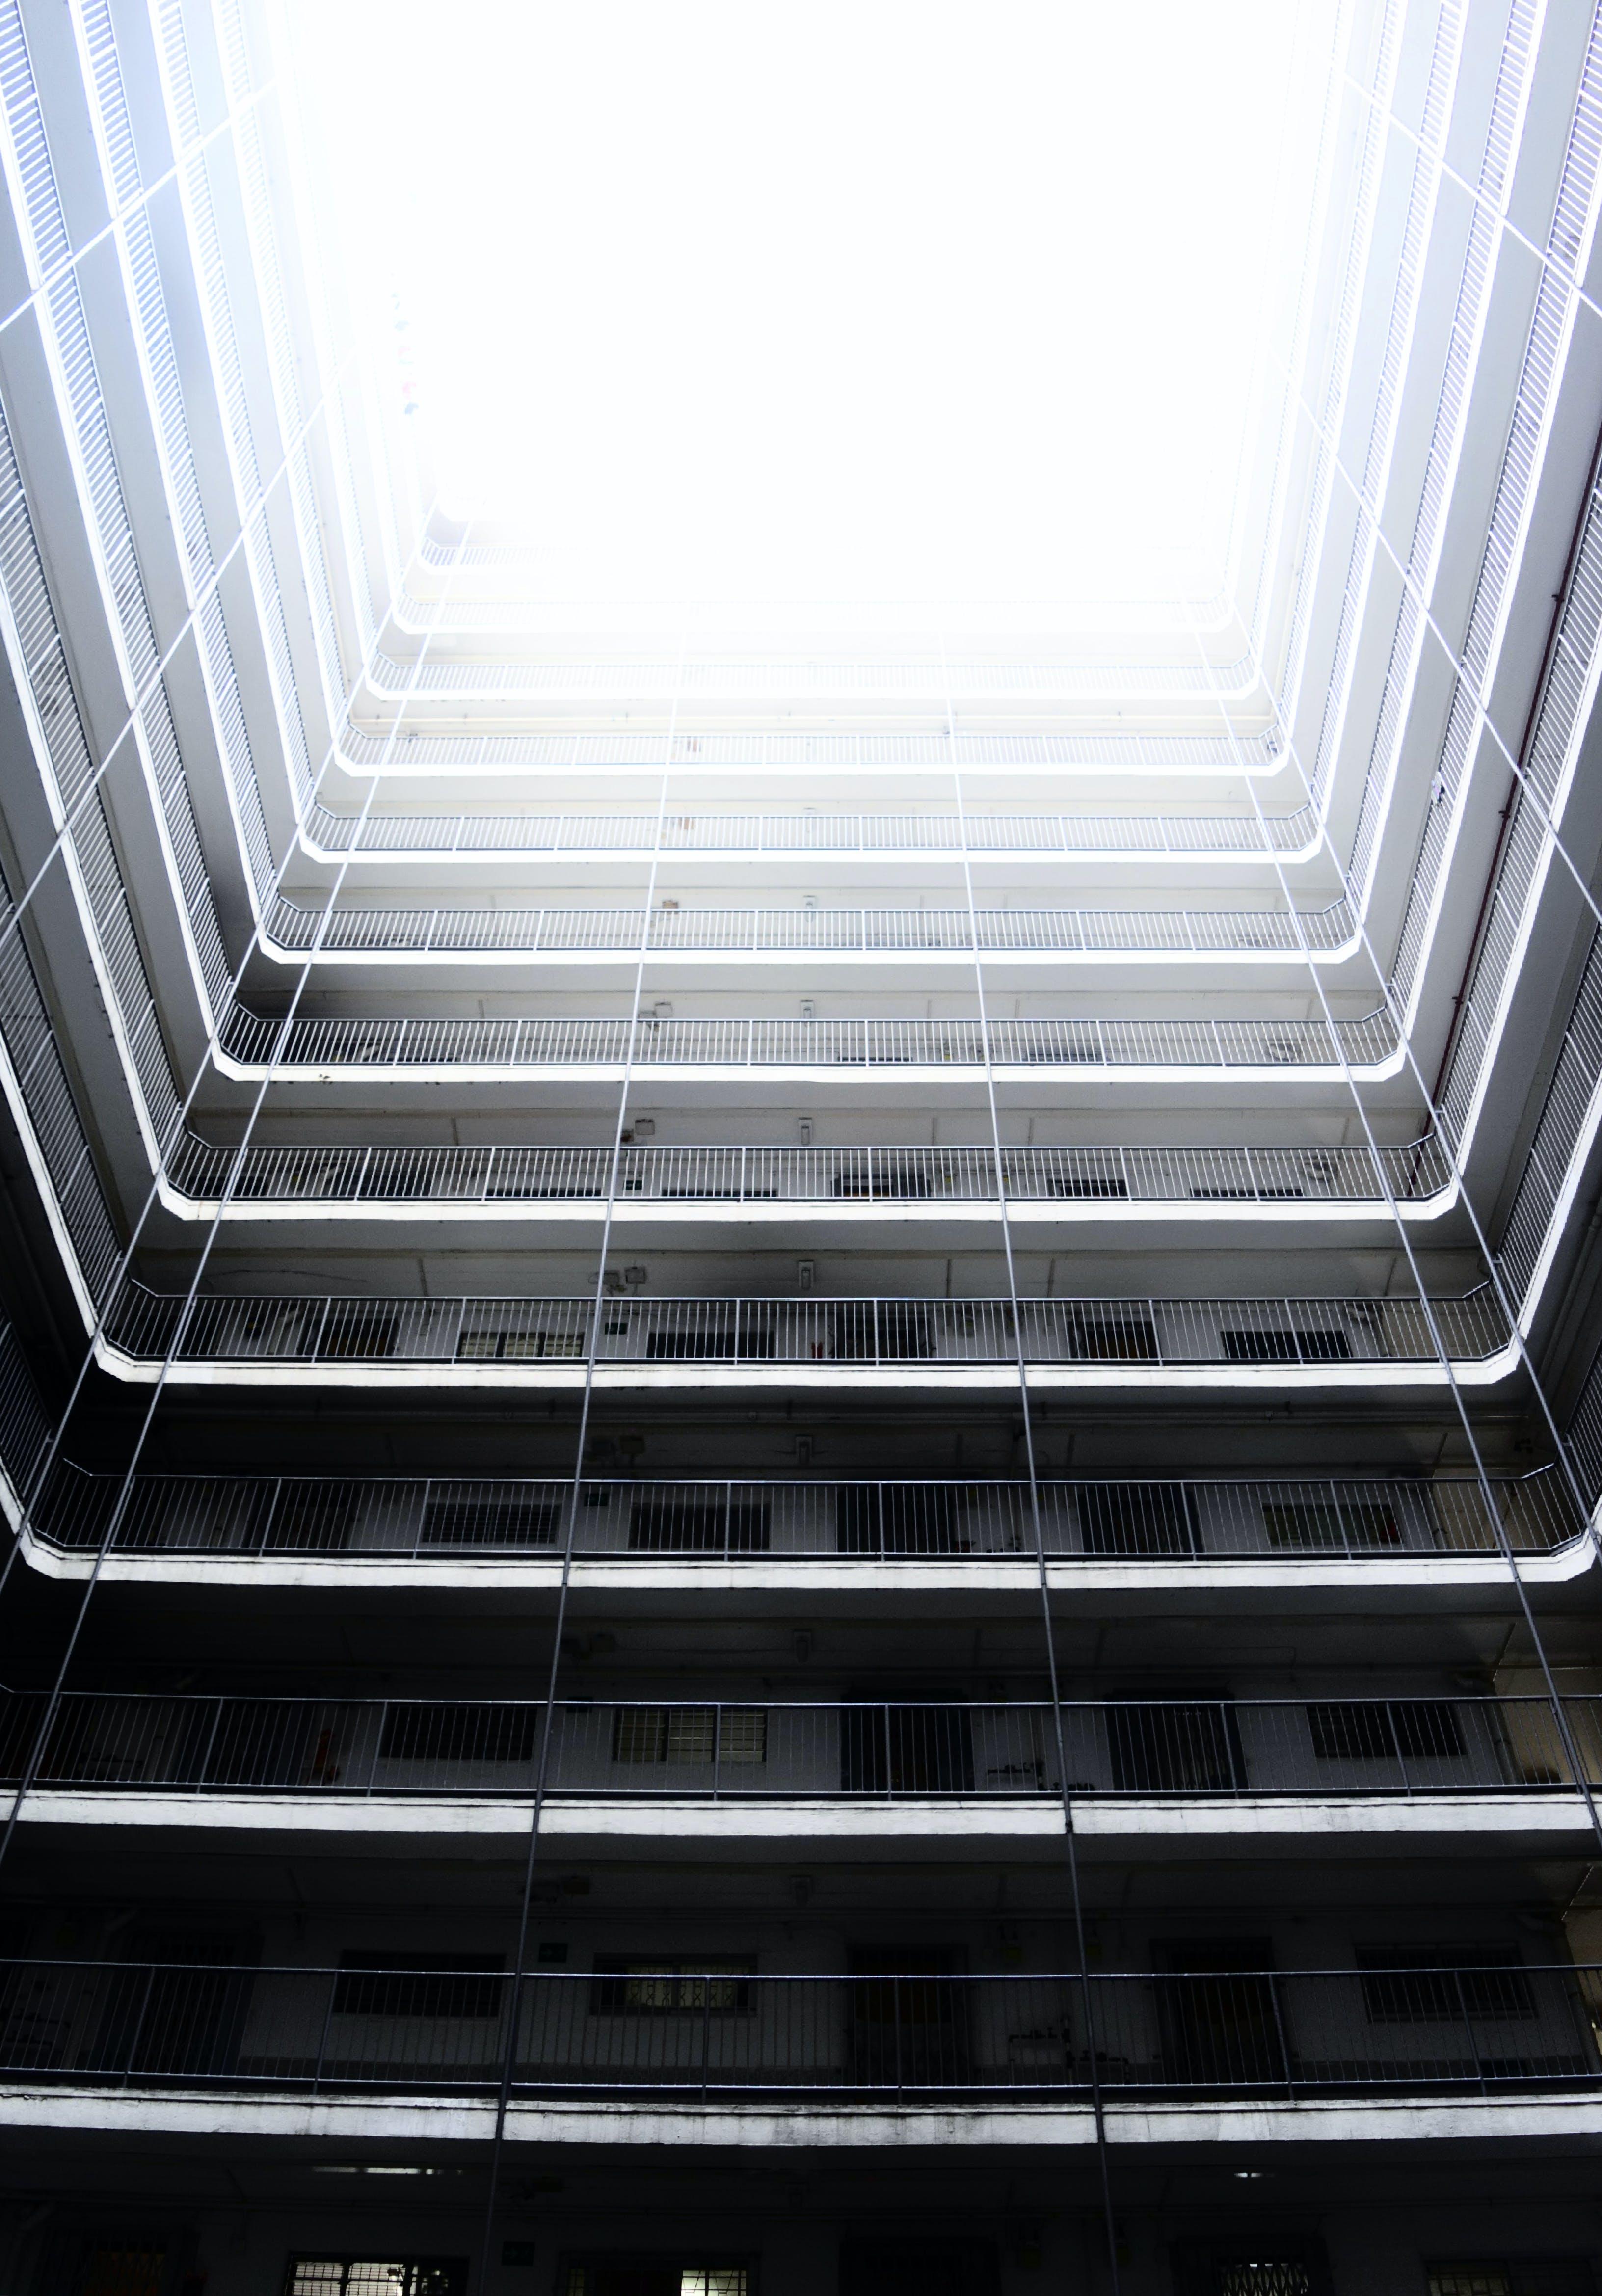 White Multi-story Building